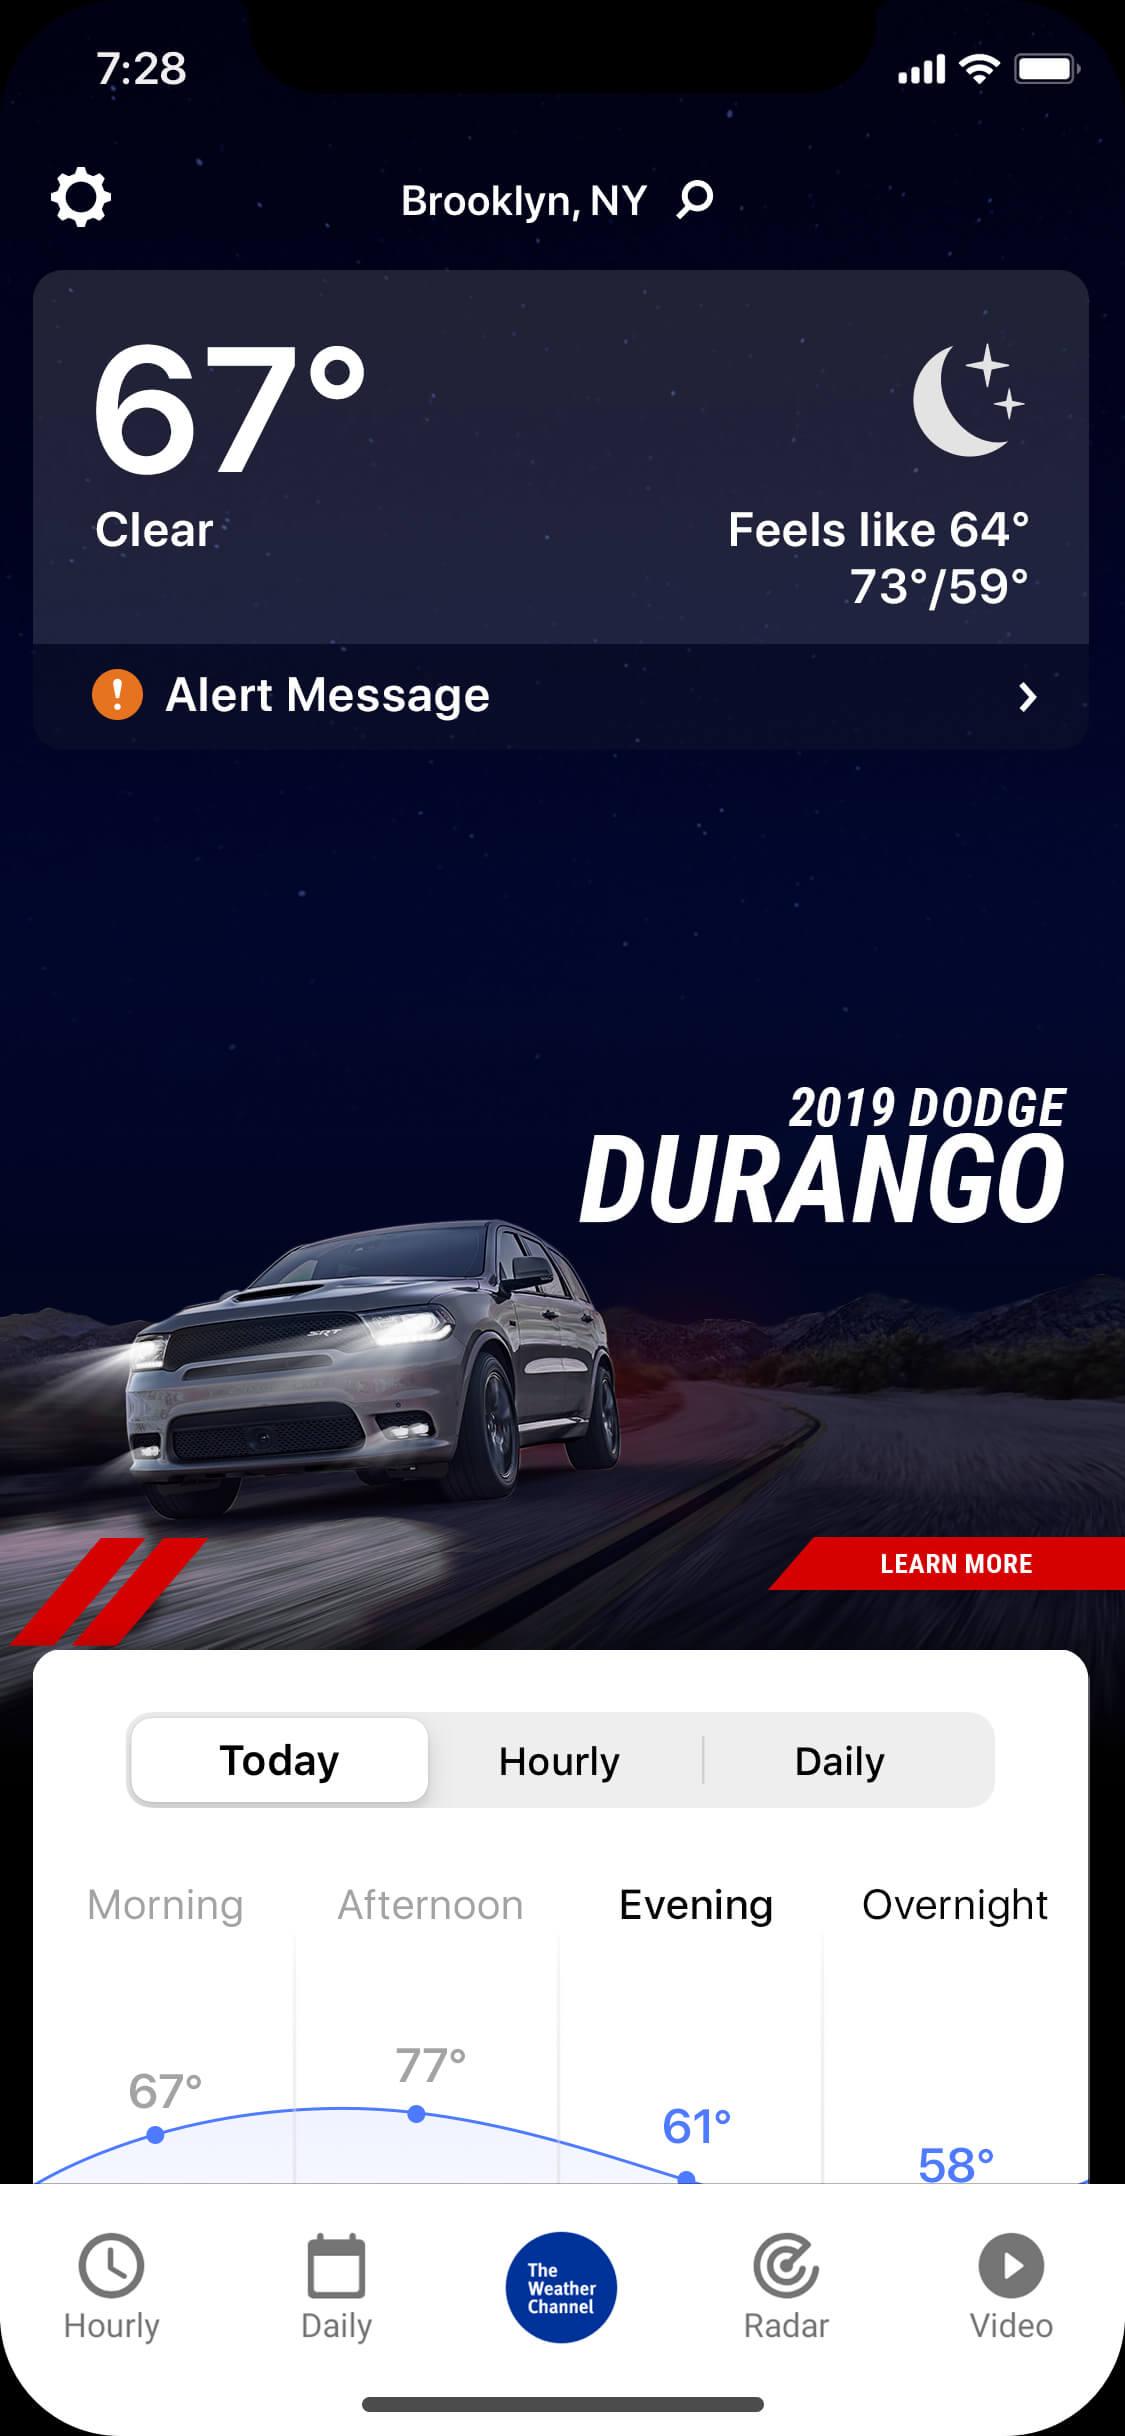 Durango_clear_night